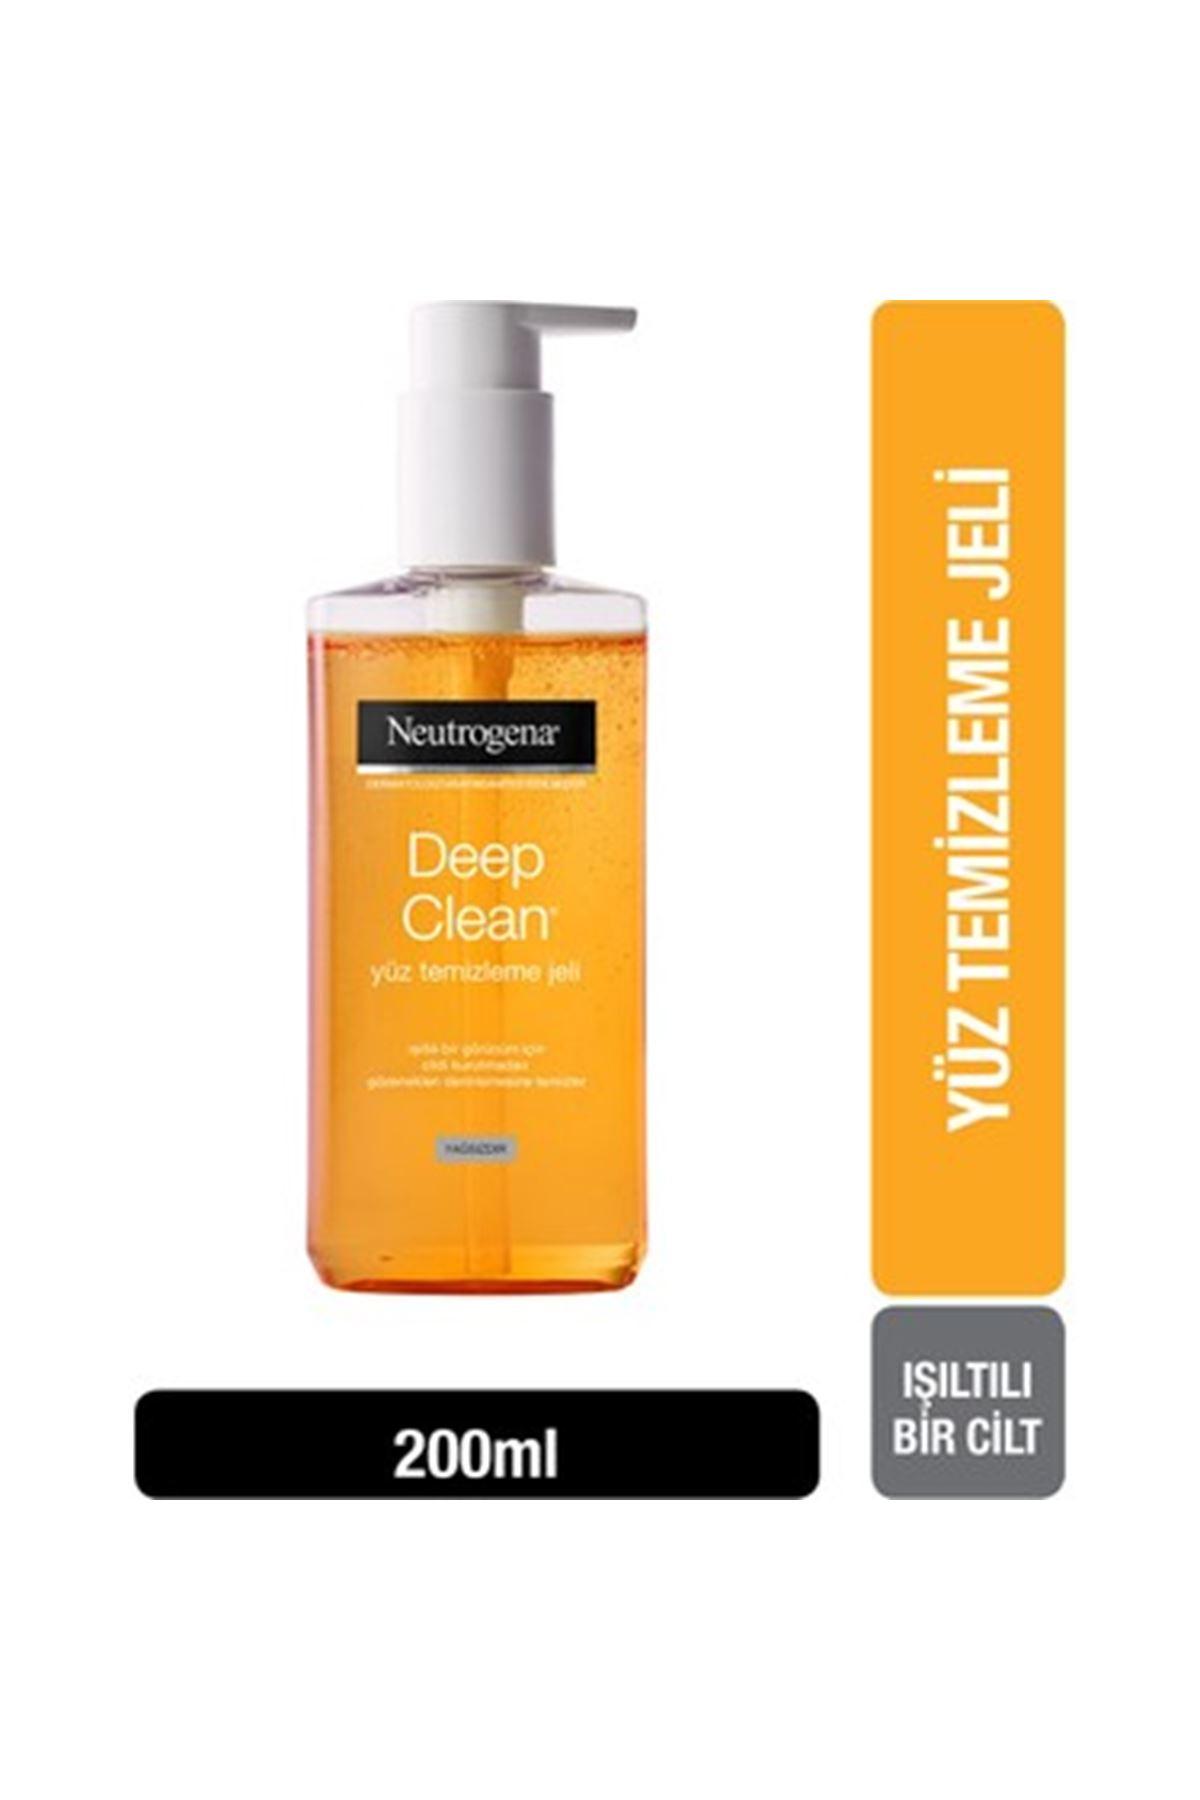 Neutrogena Deep Clean Yüz Yıkama Jeli 200 ml